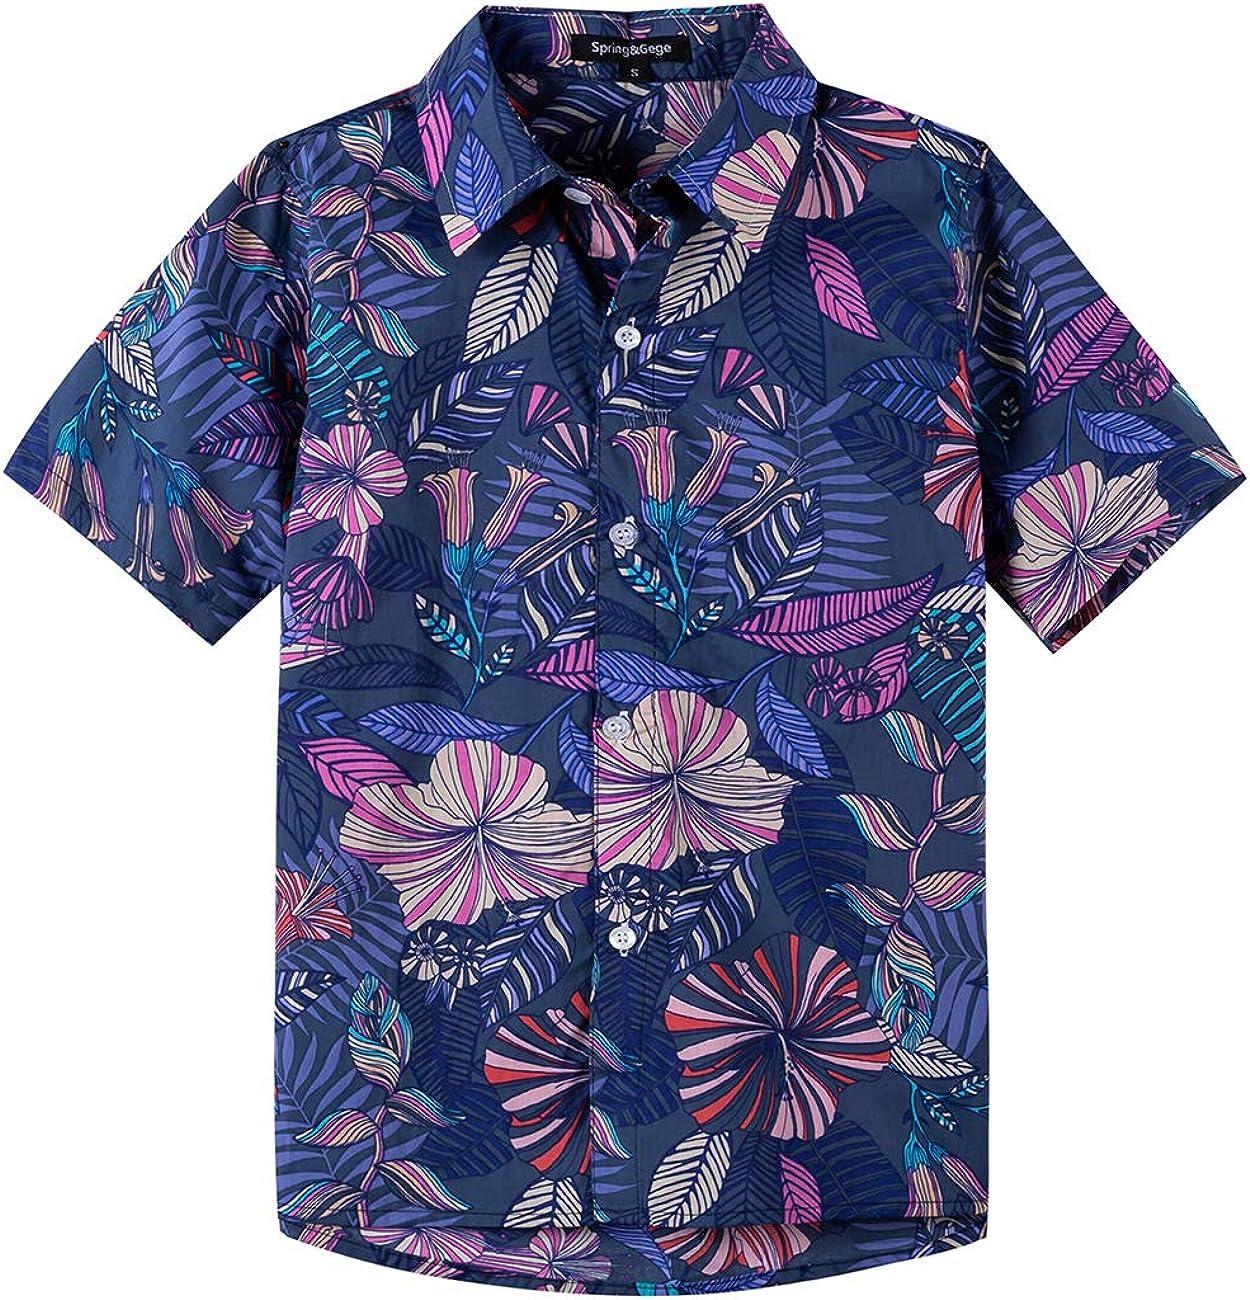 Spring&Gege Boys' Short Sleeve Hawaiian Shirt Cartoon Print Aloha Button Down Shirts (4-14 Years)